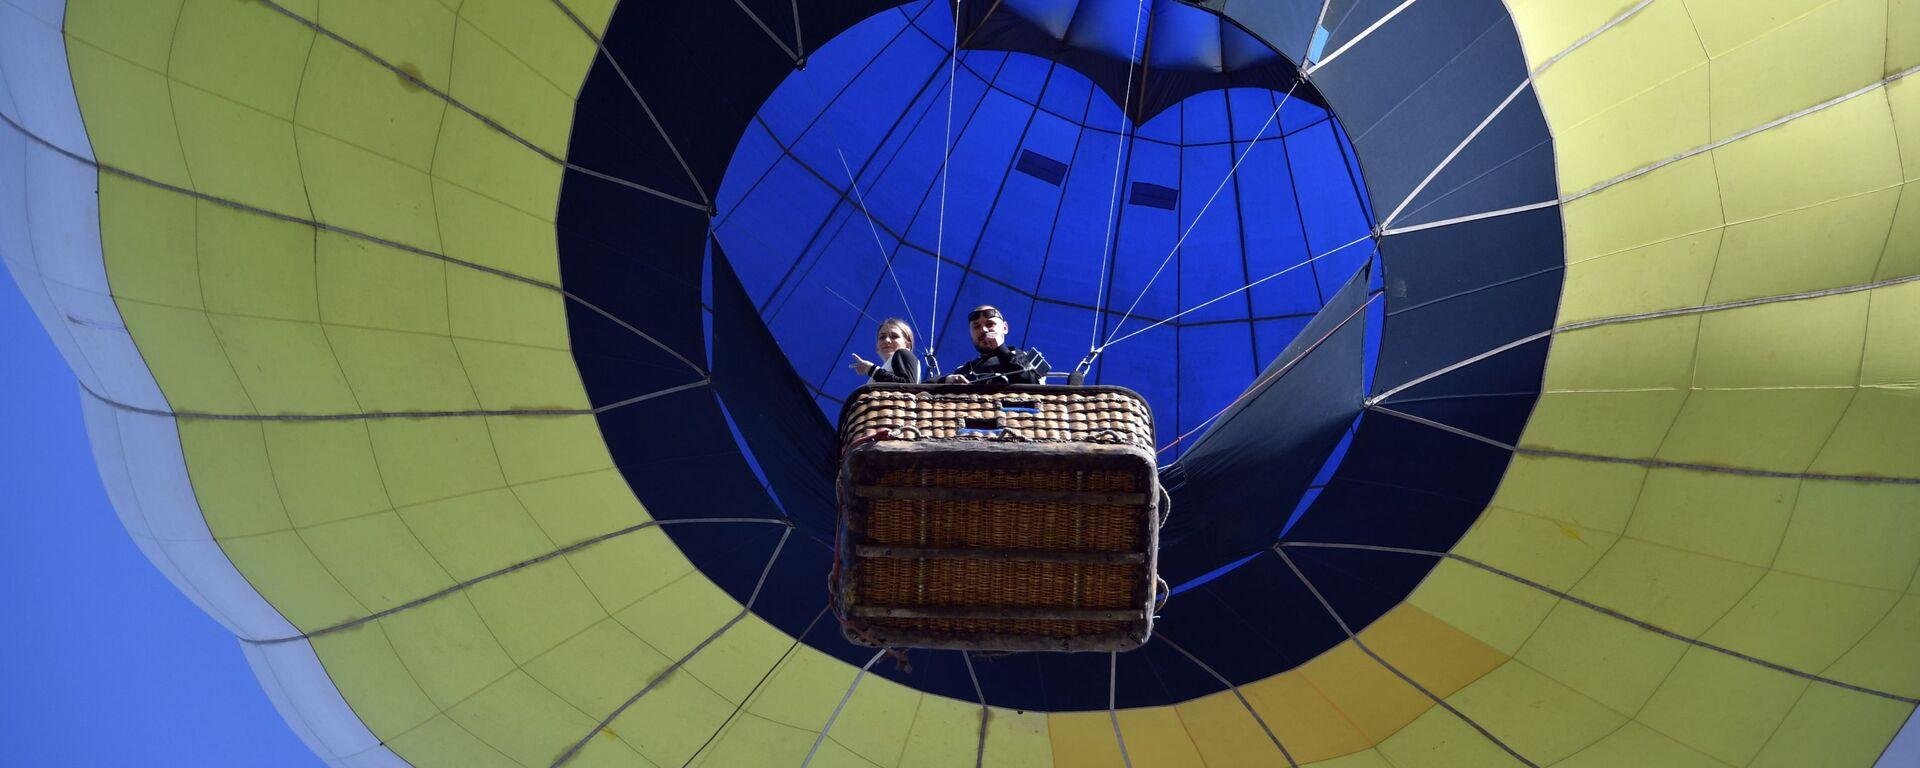 Mongolfiera - Sputnik Italia, 1920, 16.08.2021